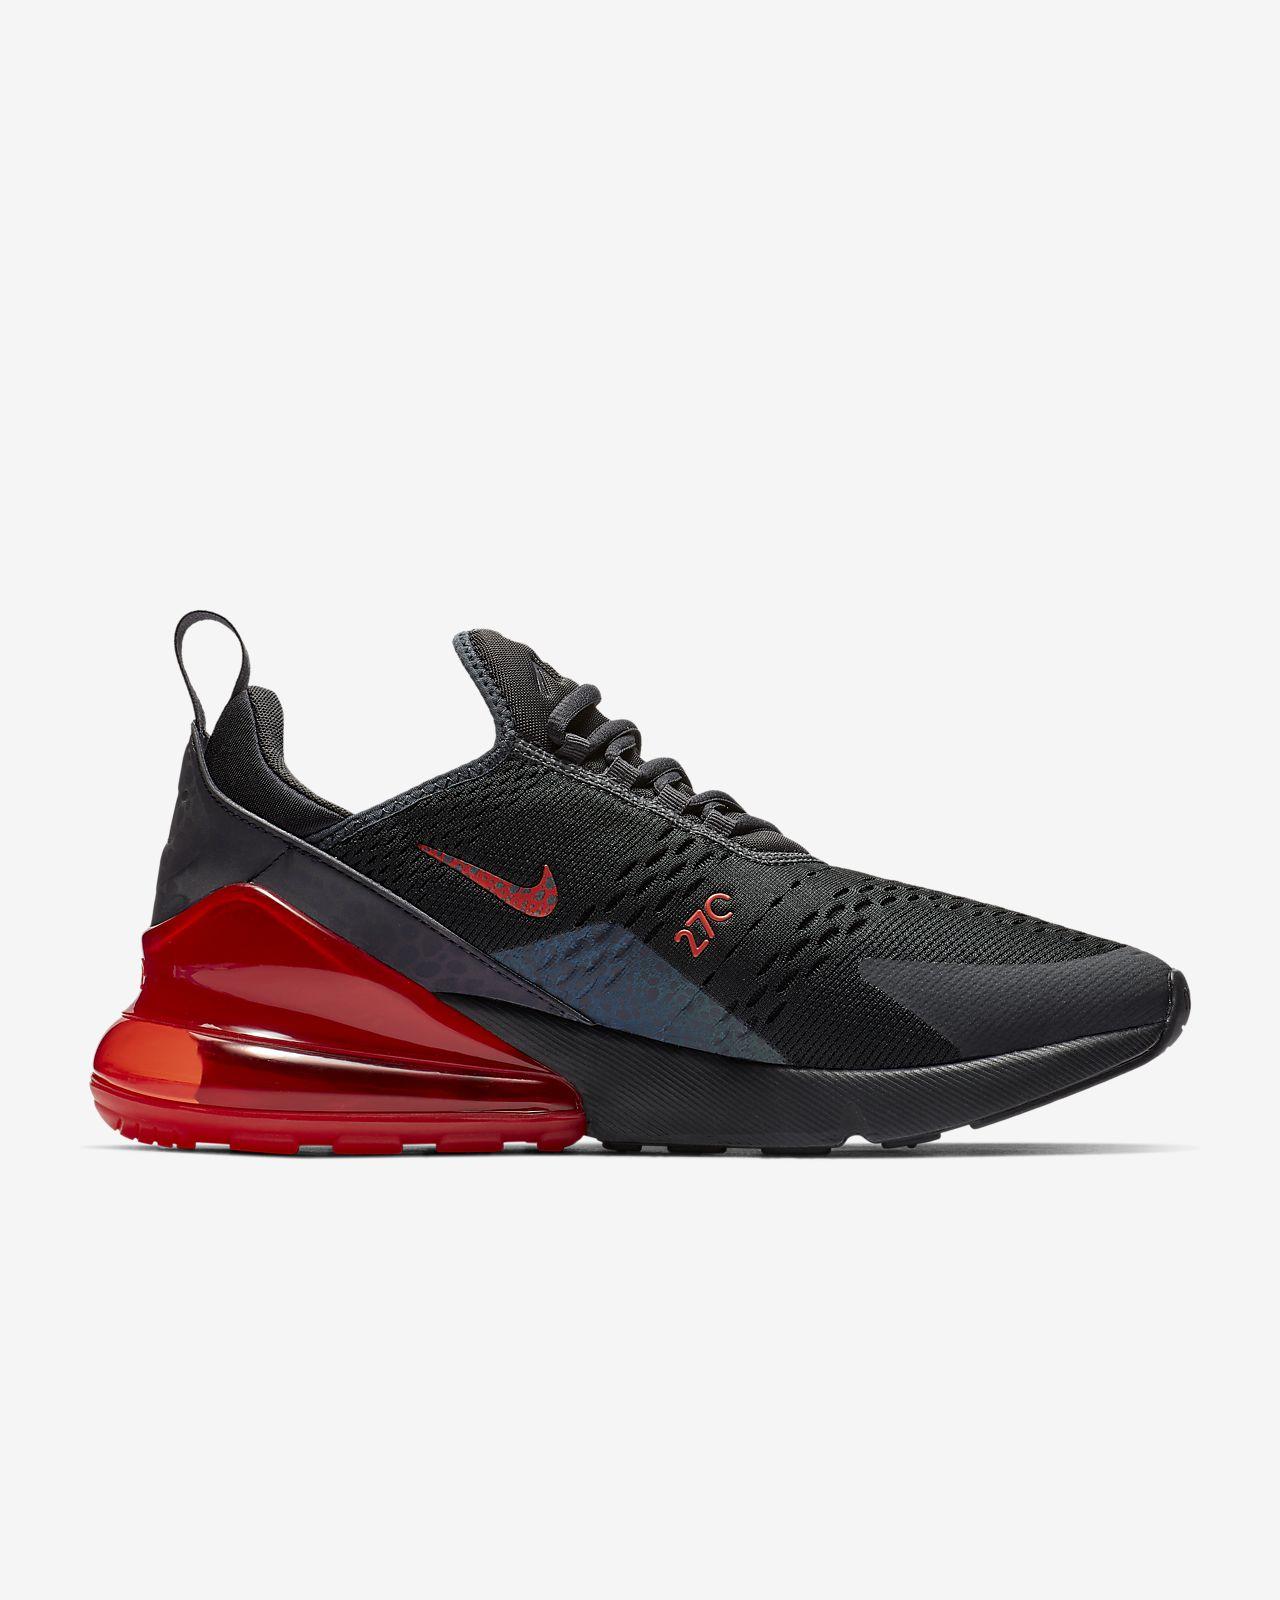 Nike Air Max 270 SE Reflective Men's Shoe